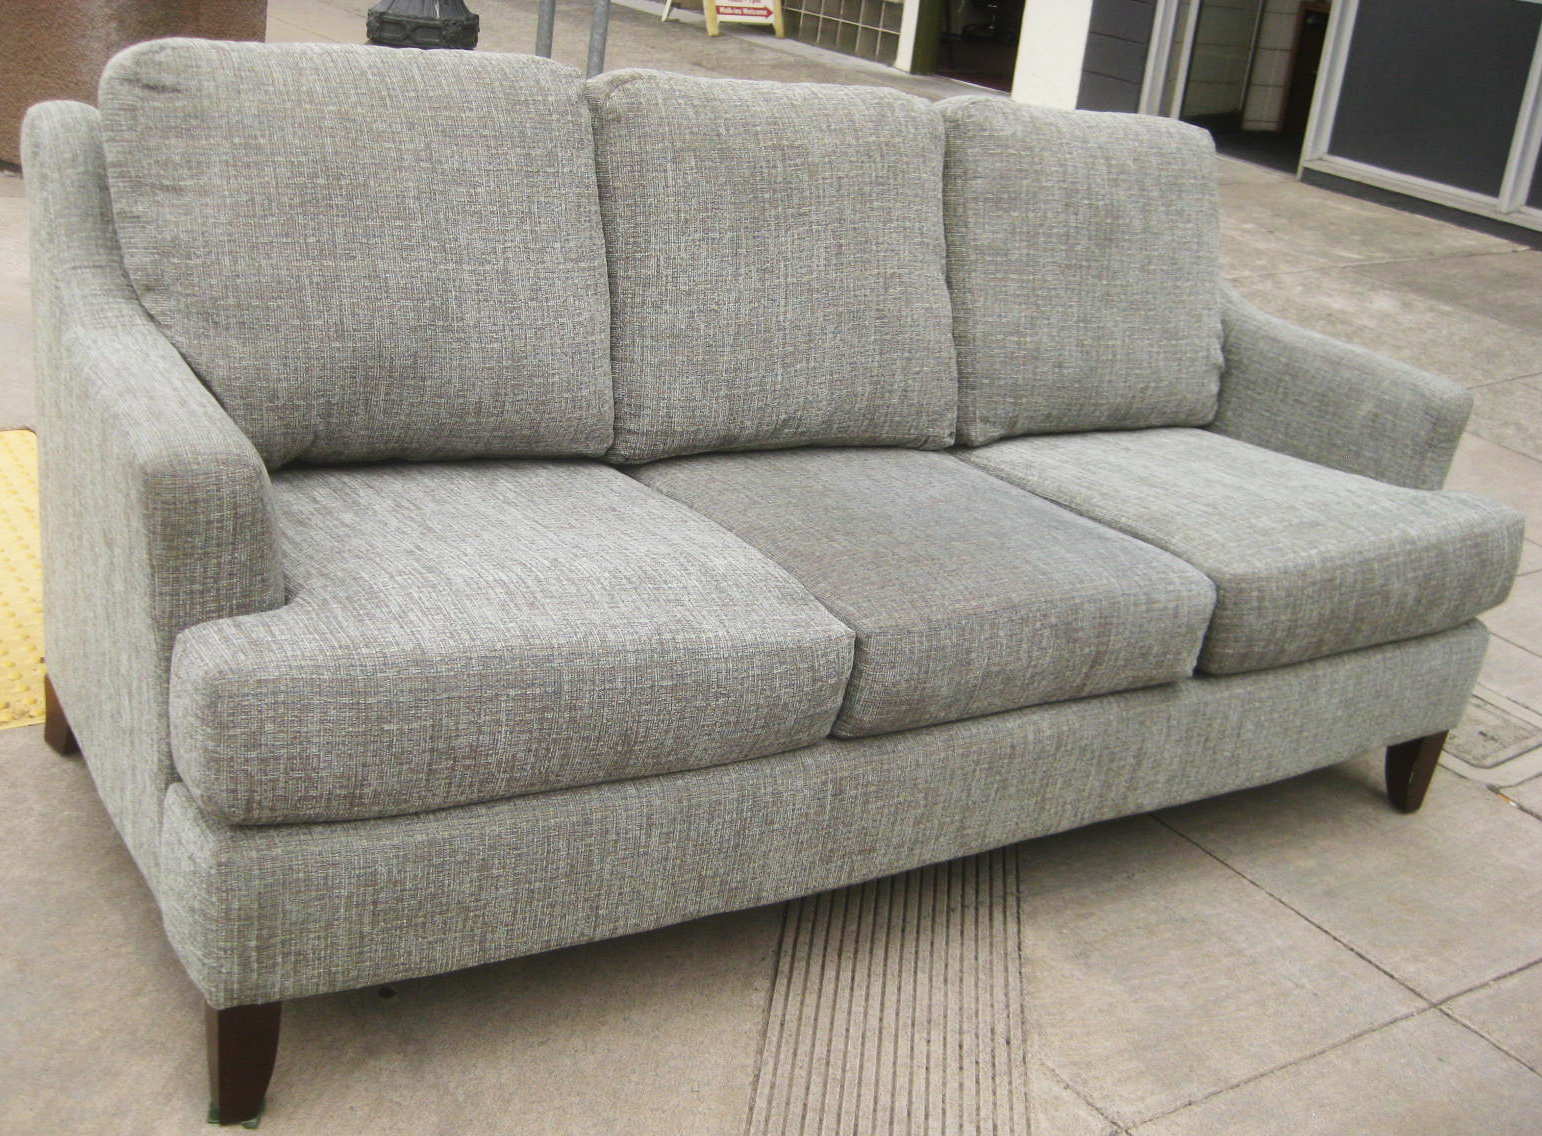 Uhuru Furniture Amp Collectibles Sold Comfy Gray Sofa 145